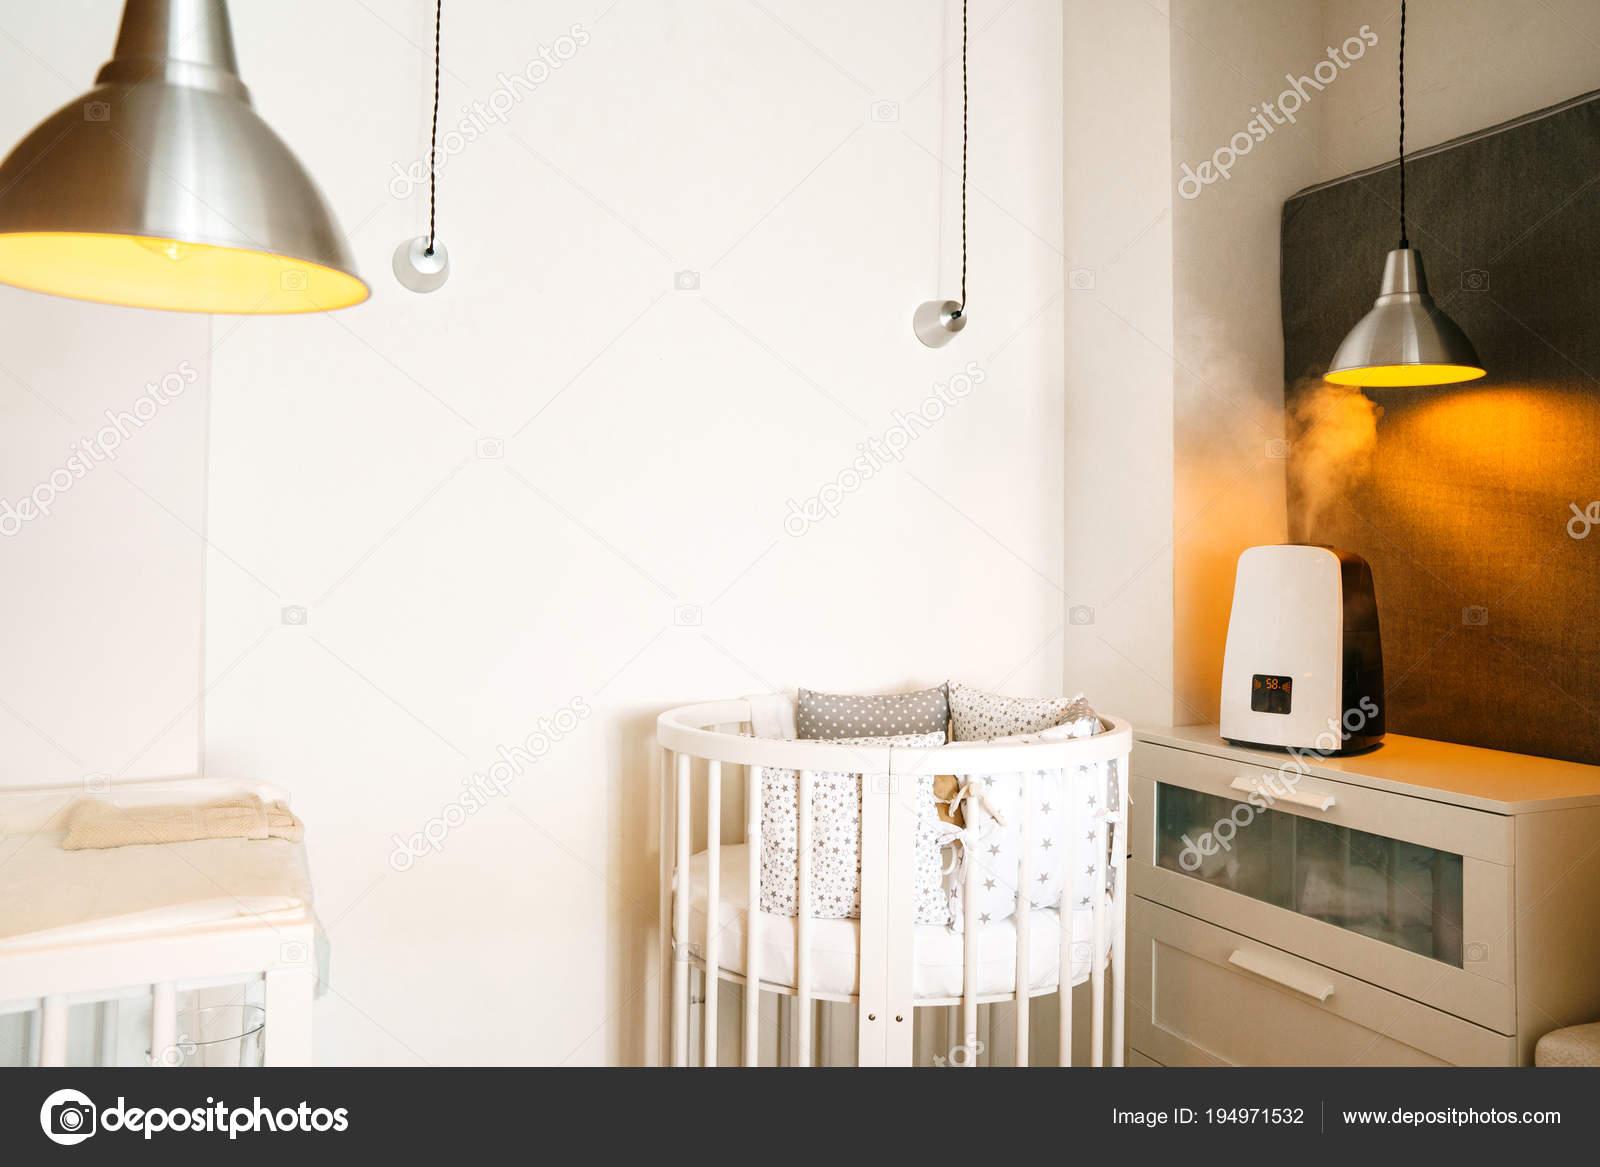 Technologie gezondheid stoom luchtbevochtiger slaapkamer van